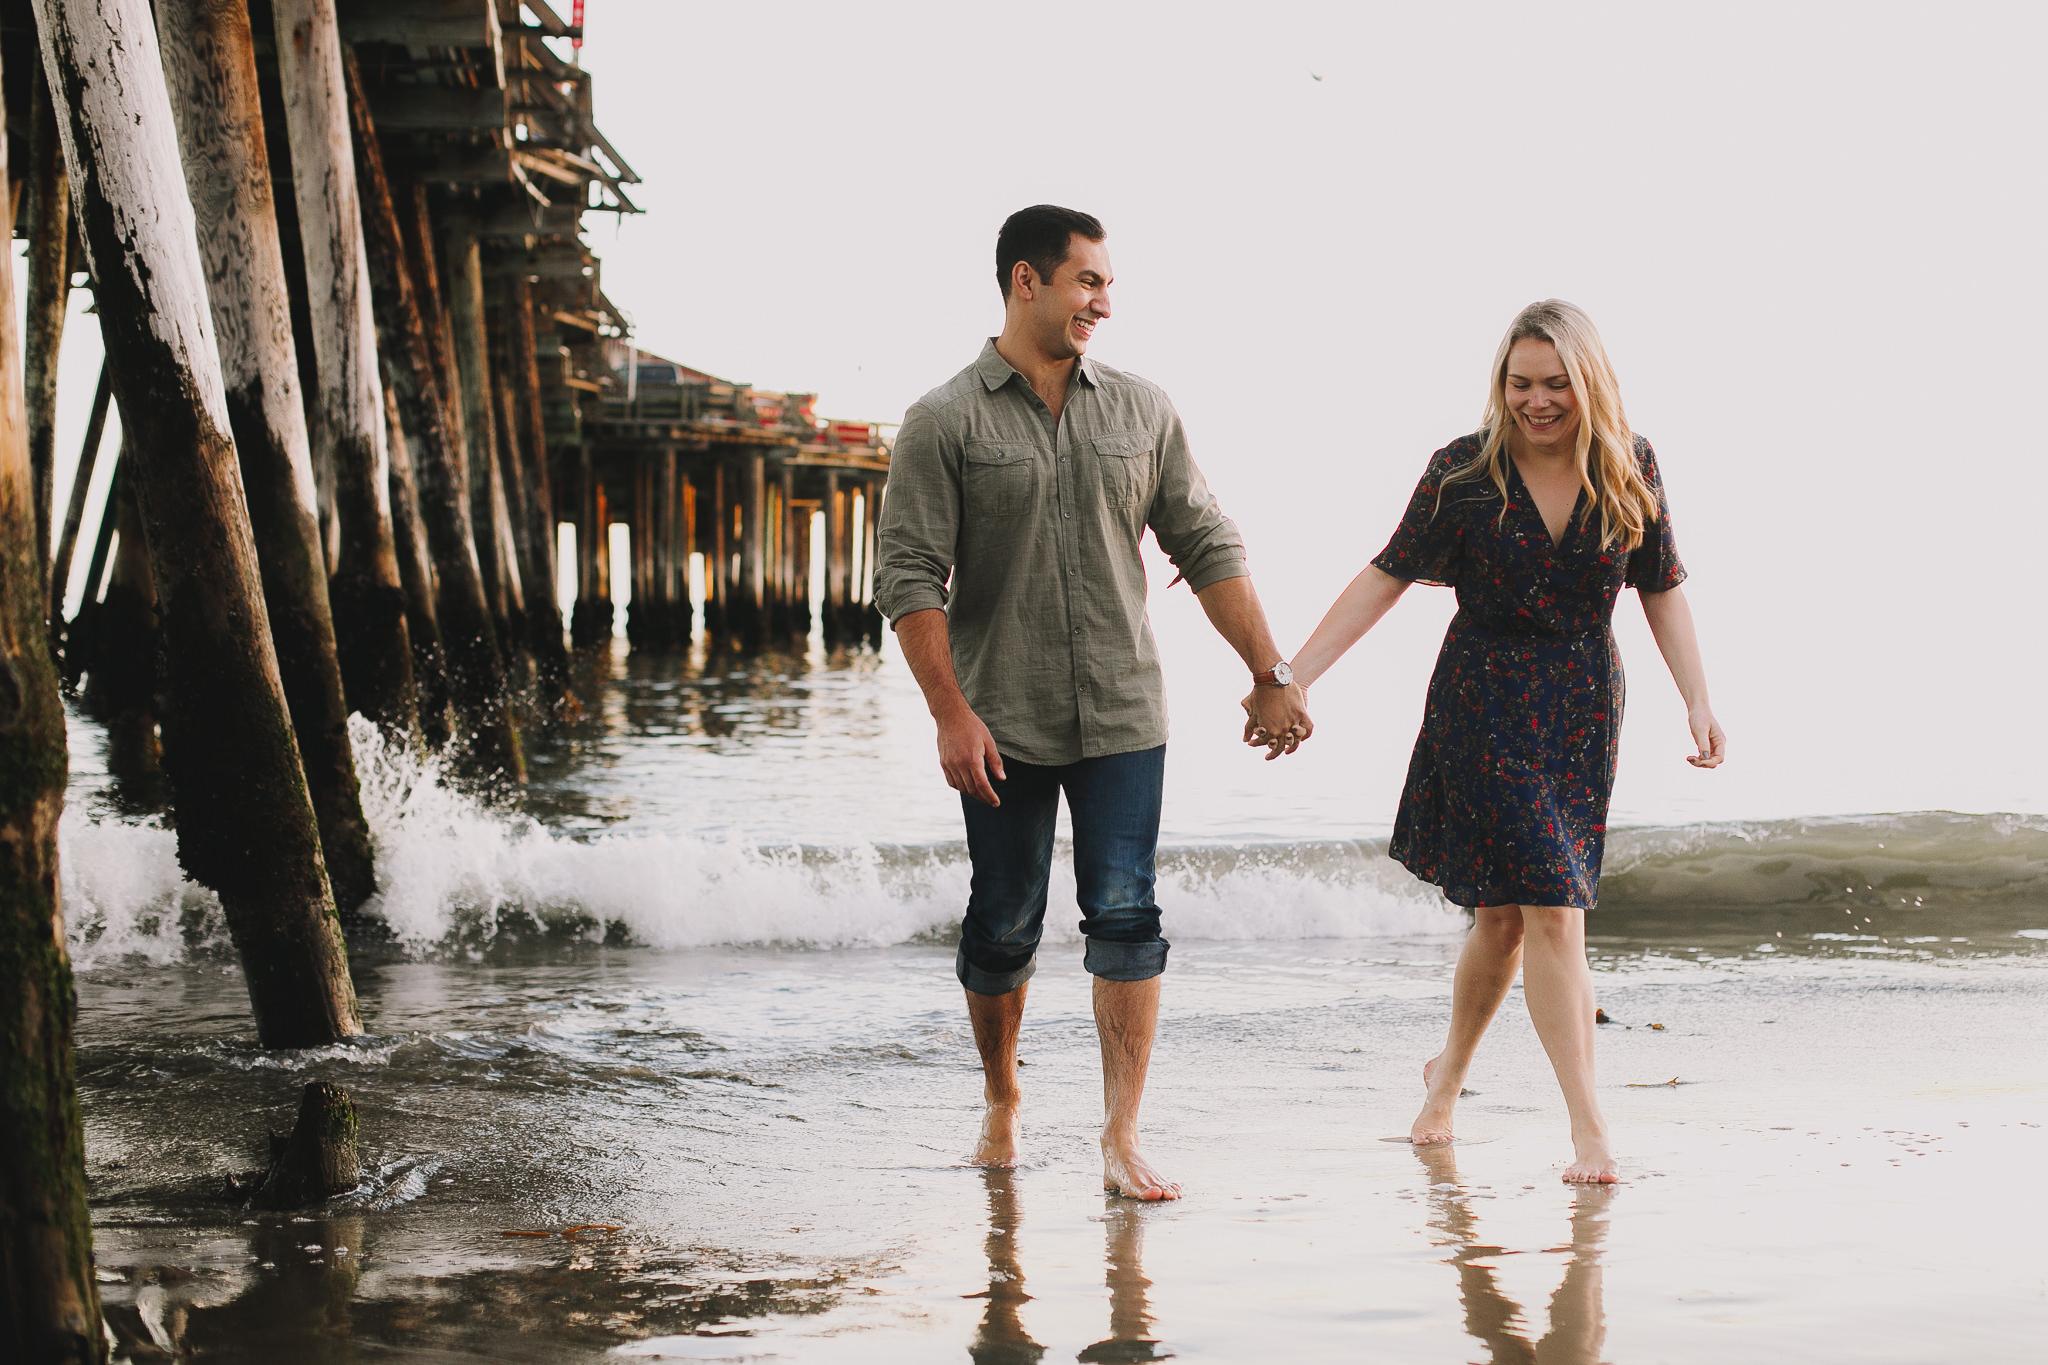 Archer Inspired Photography Capitola Beach Santa Cruz Wedding Engagement Lifestyle Session Photographer-132.jpg